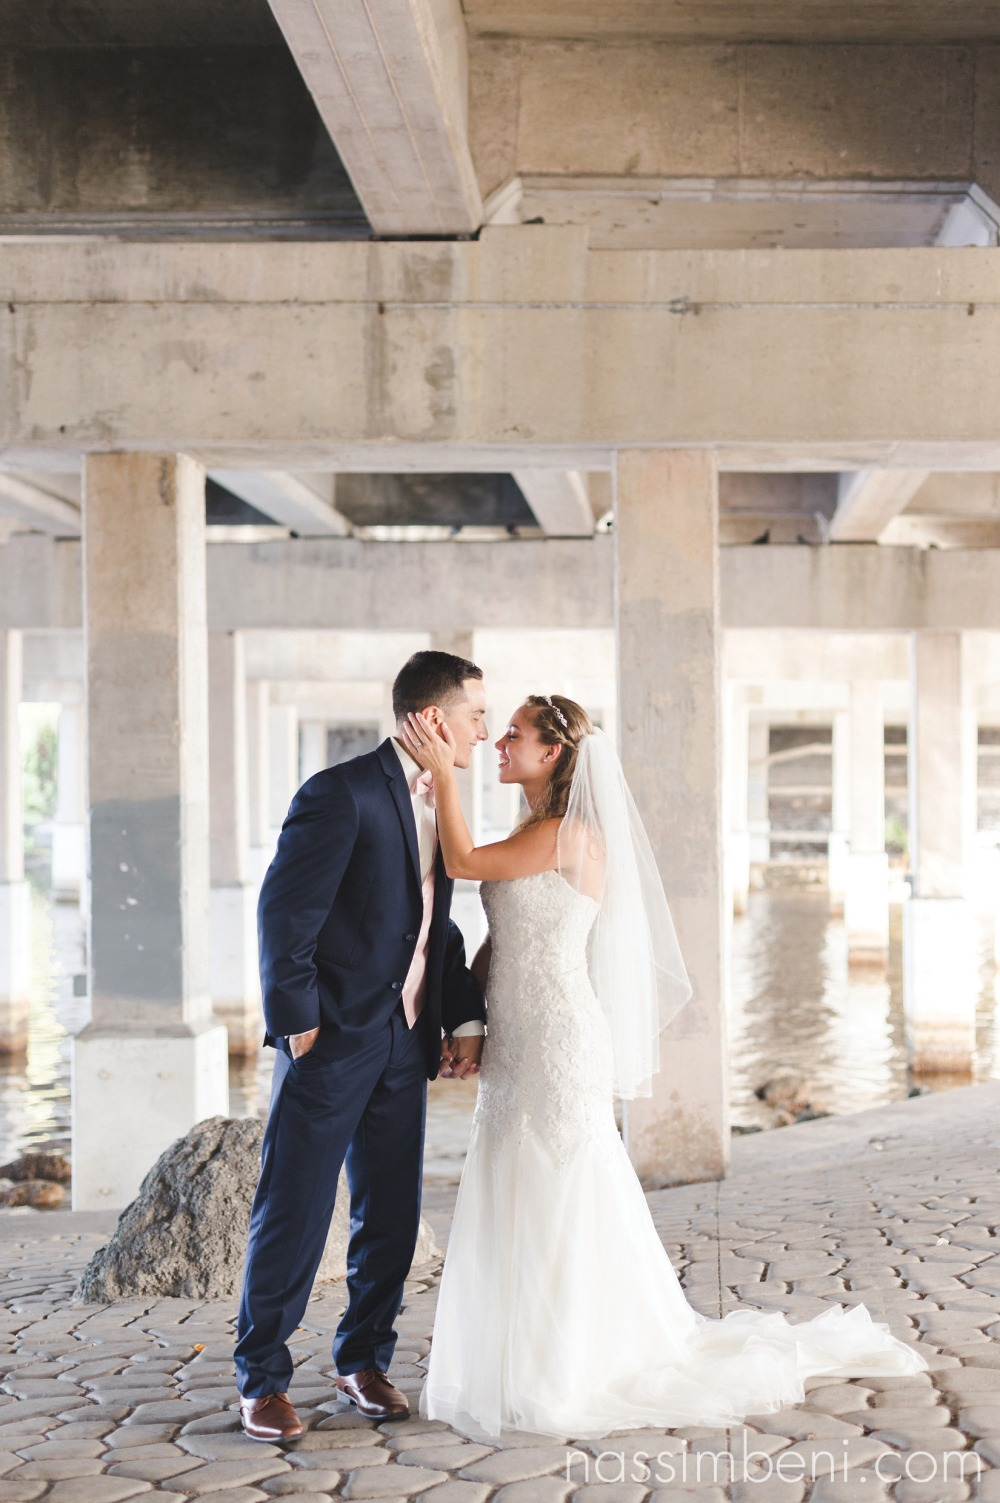 bride and groom formal photos at crane creek promenade park by nassimbeni photography